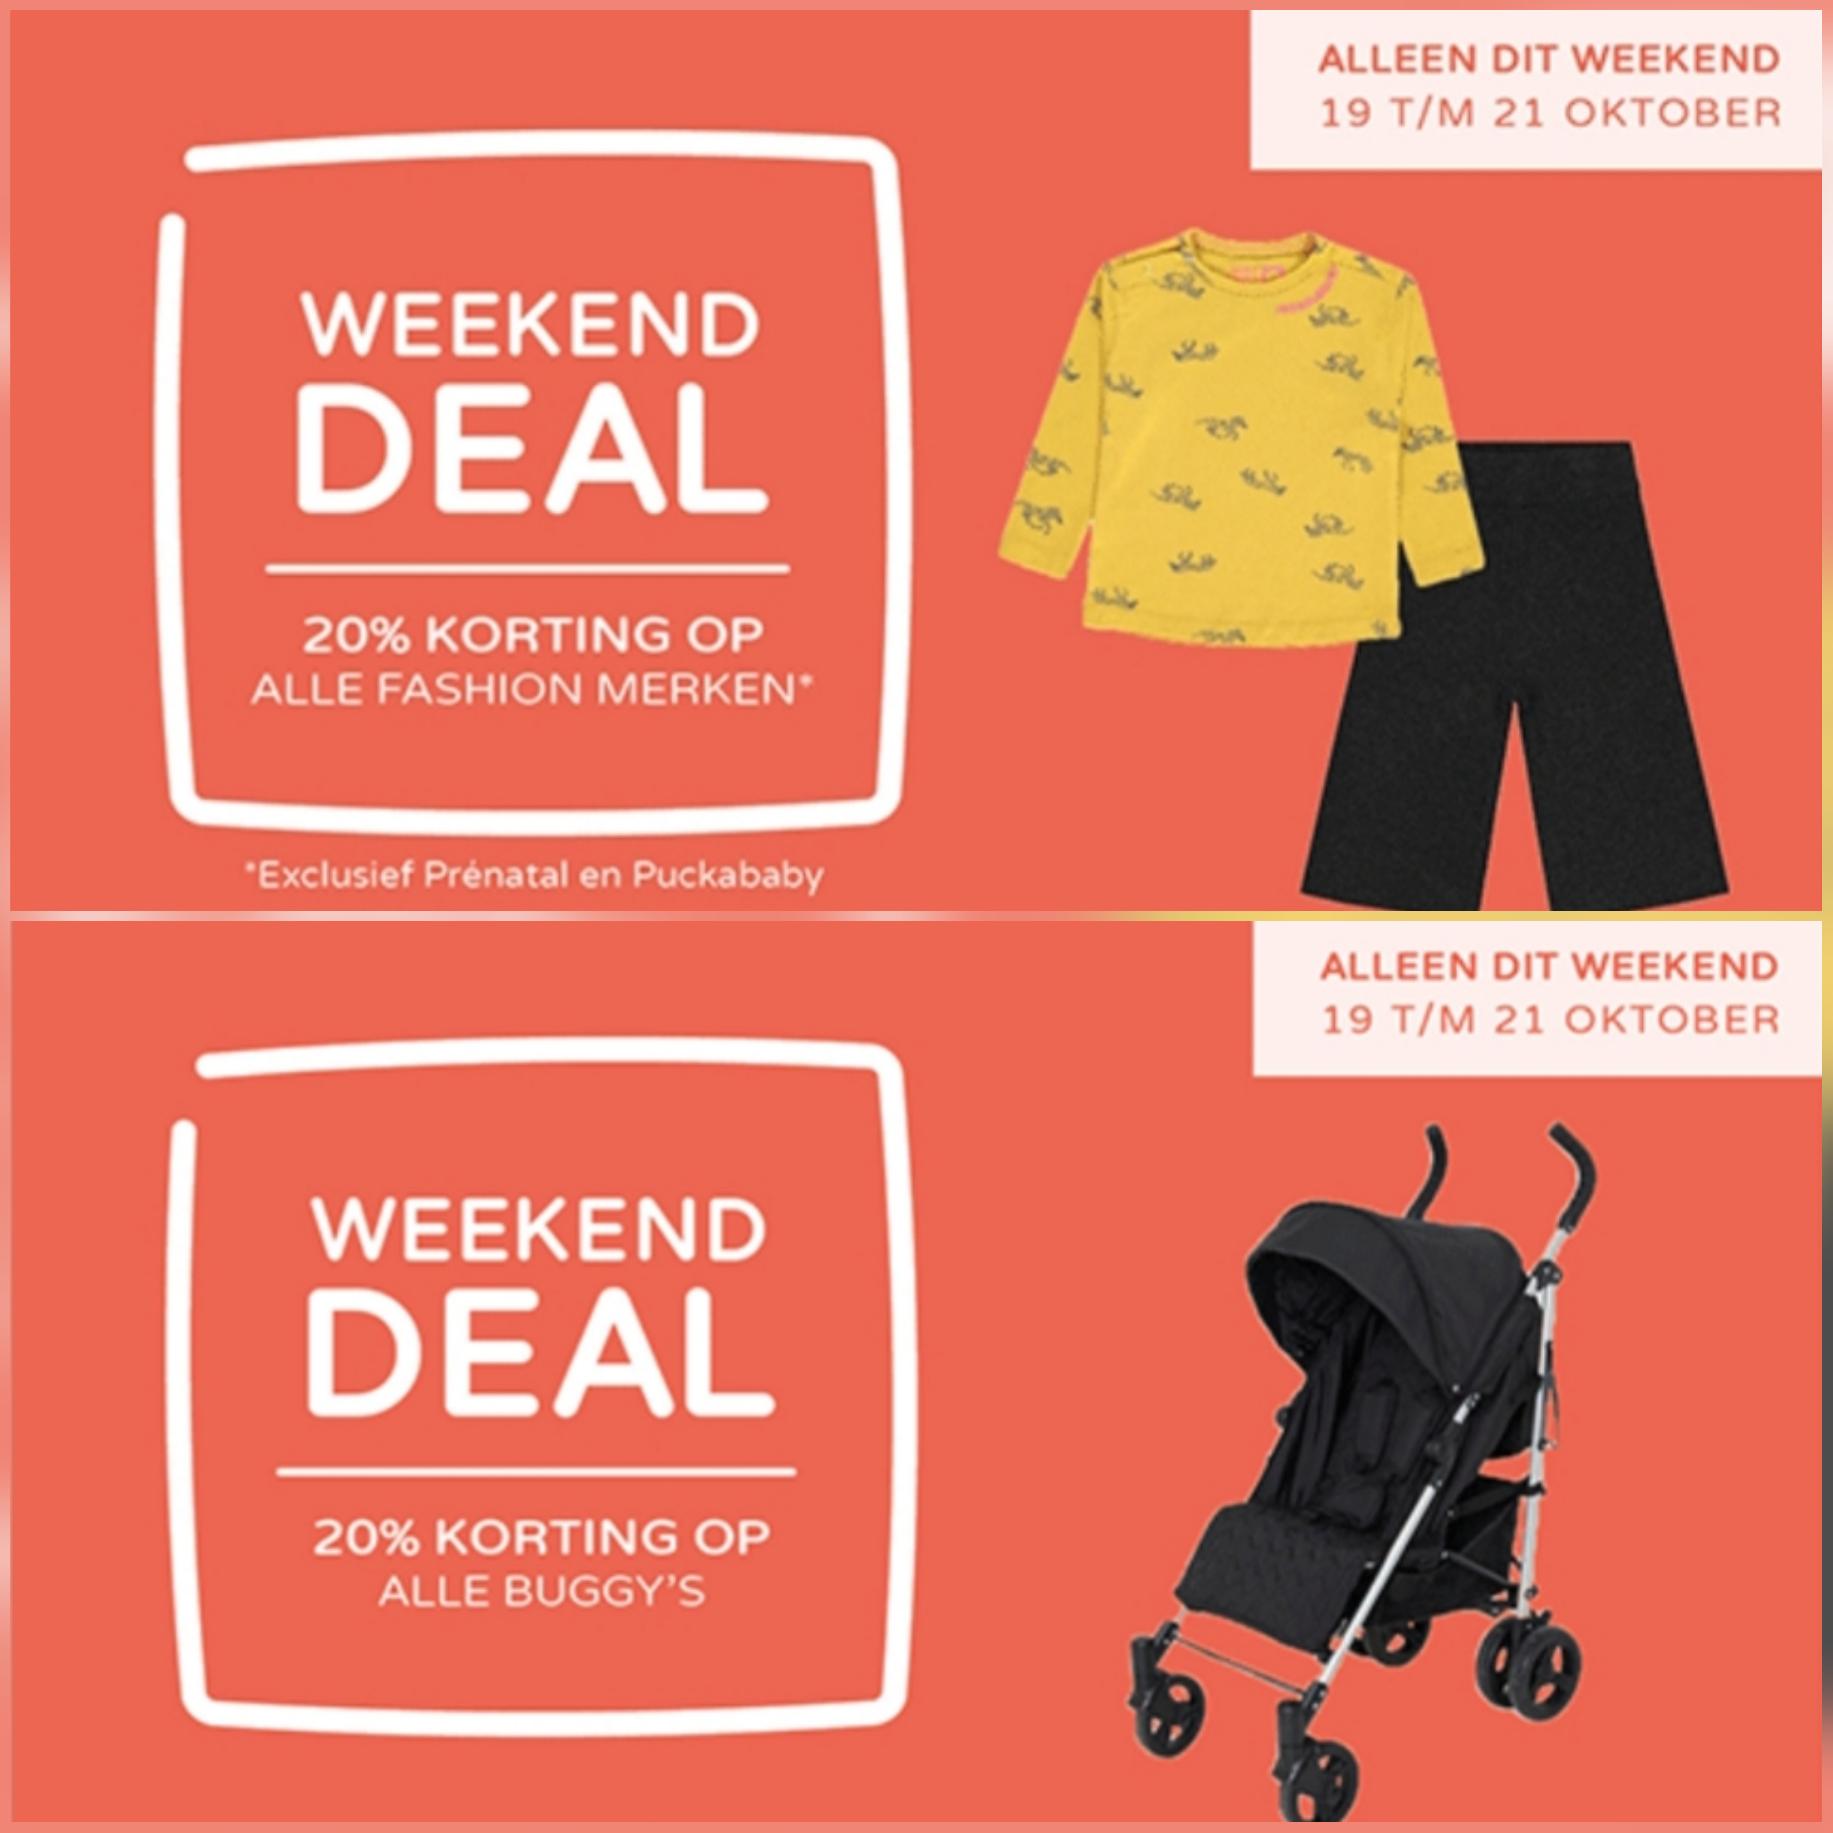 Weekend deal bij Prénatal 20% korting op alle fashion merken en buggy's!